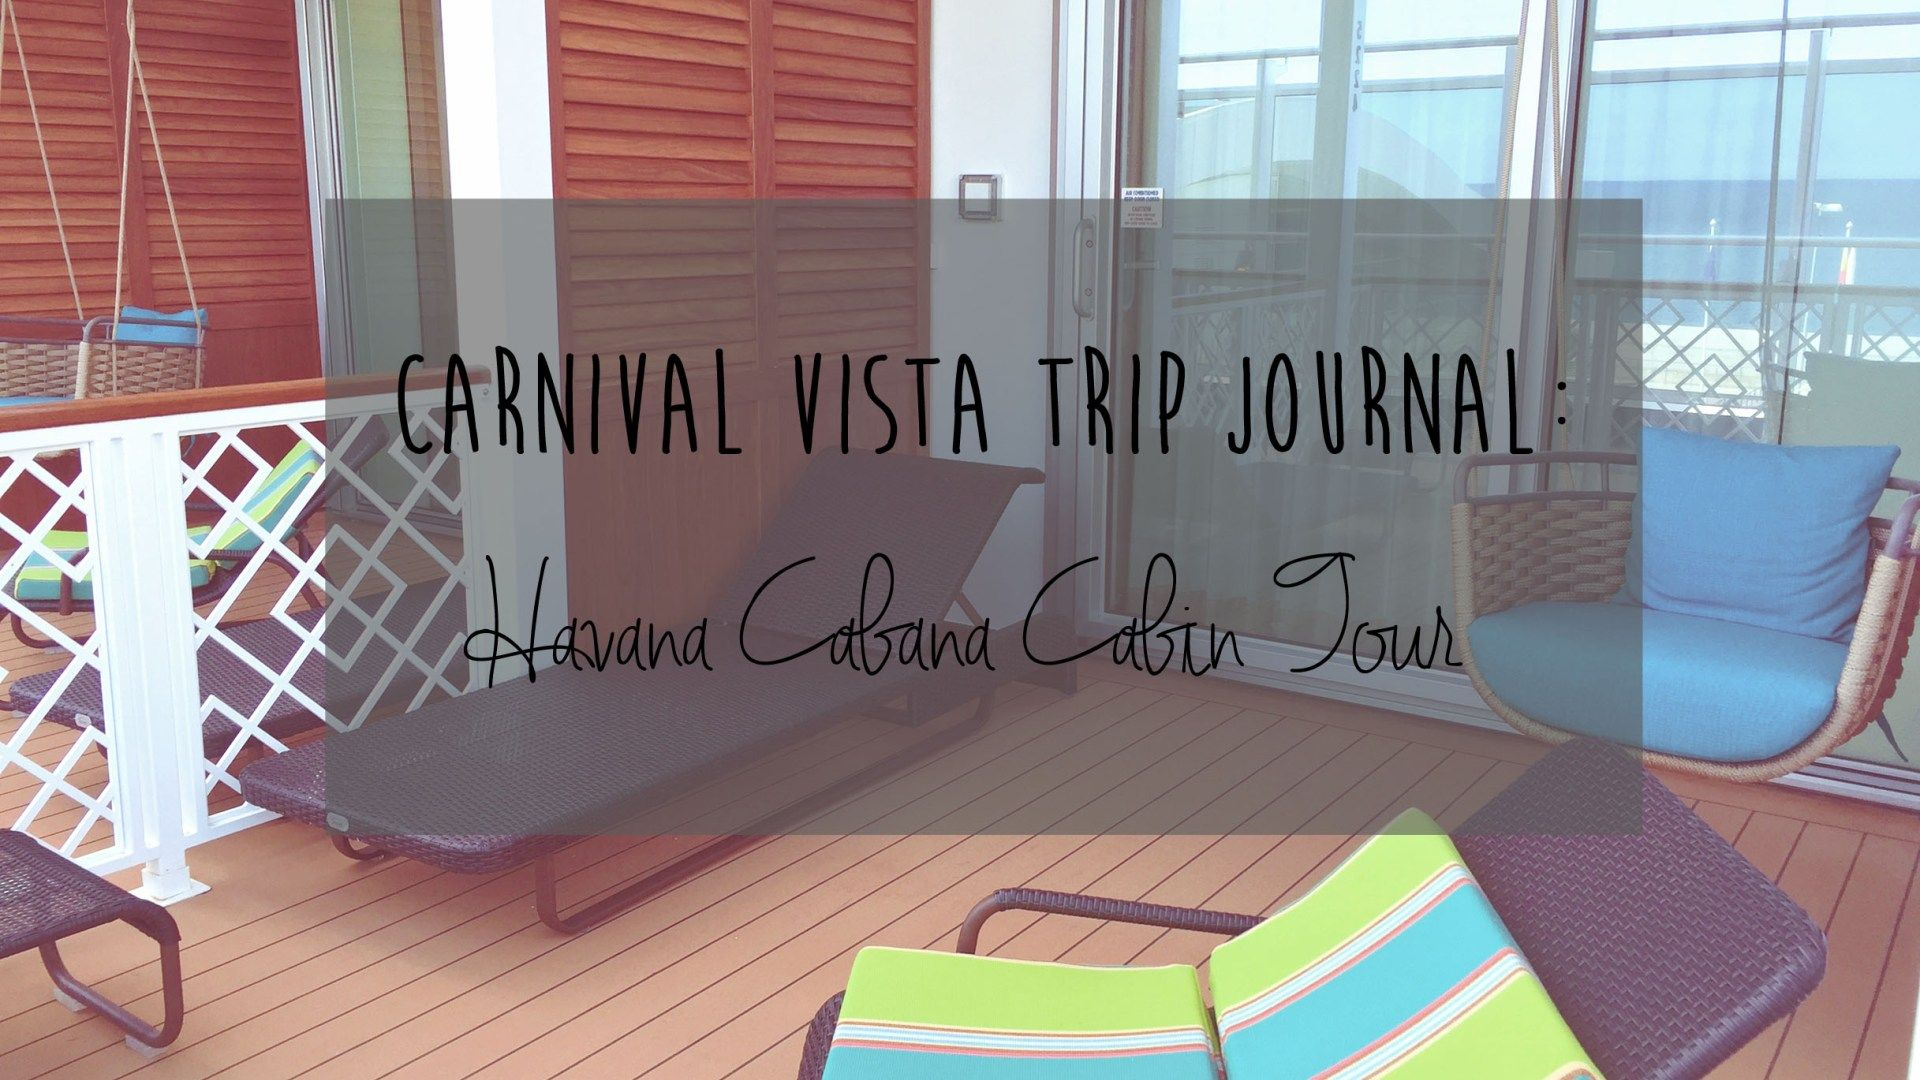 Carnival Vista Review: Inside the Havana Cabana Cabin & Pool Deck